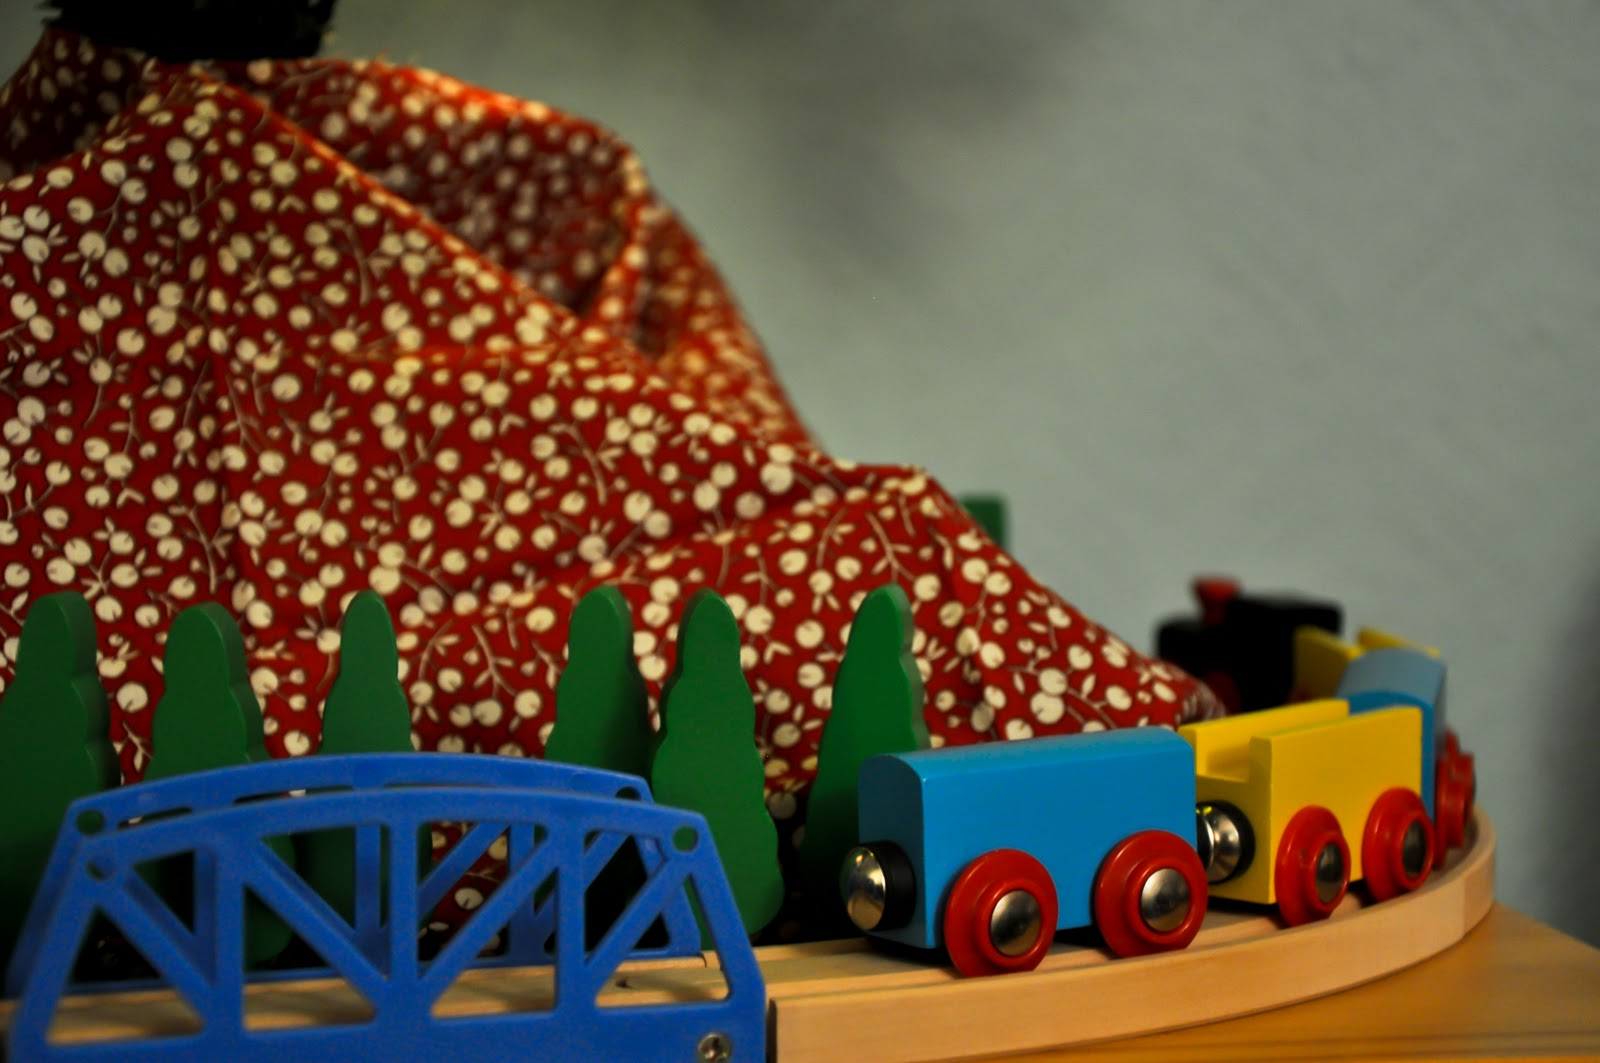 Train Set Around The Christmas